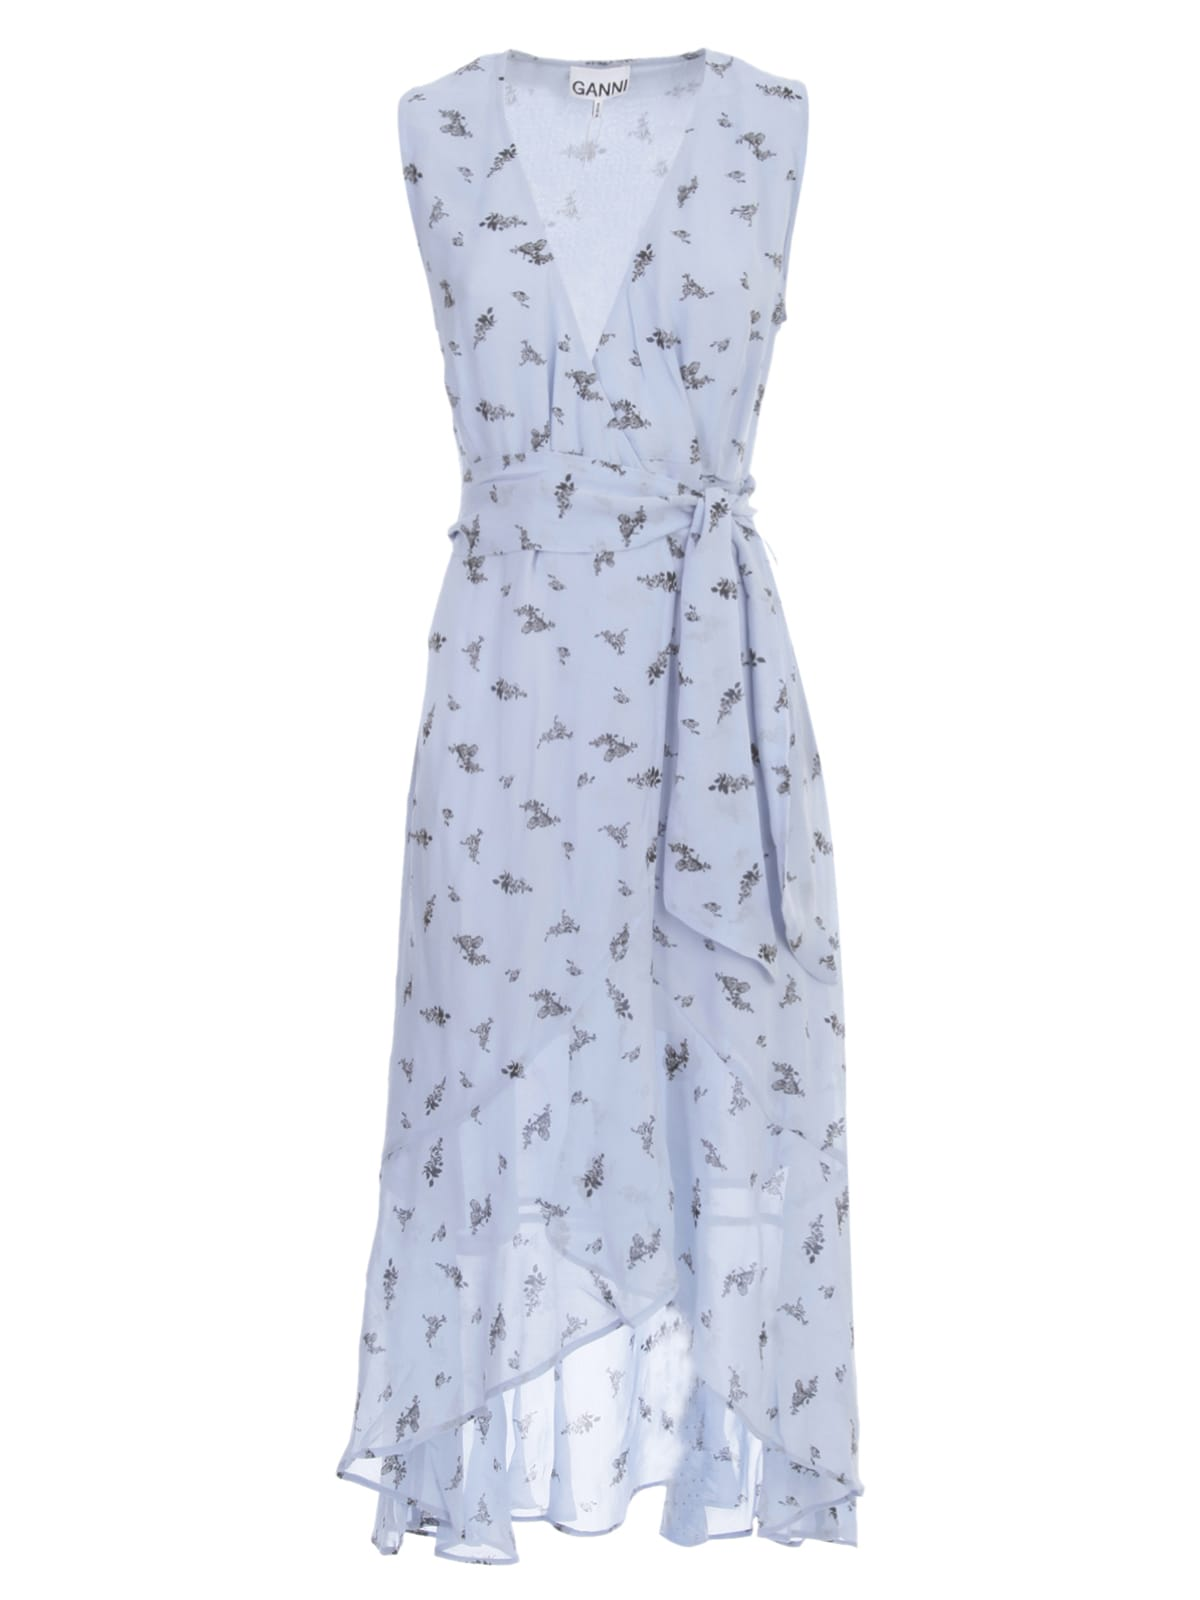 Buy Ganni Printed Georgette Dress W/s V Neck W/belt online, shop Ganni with free shipping